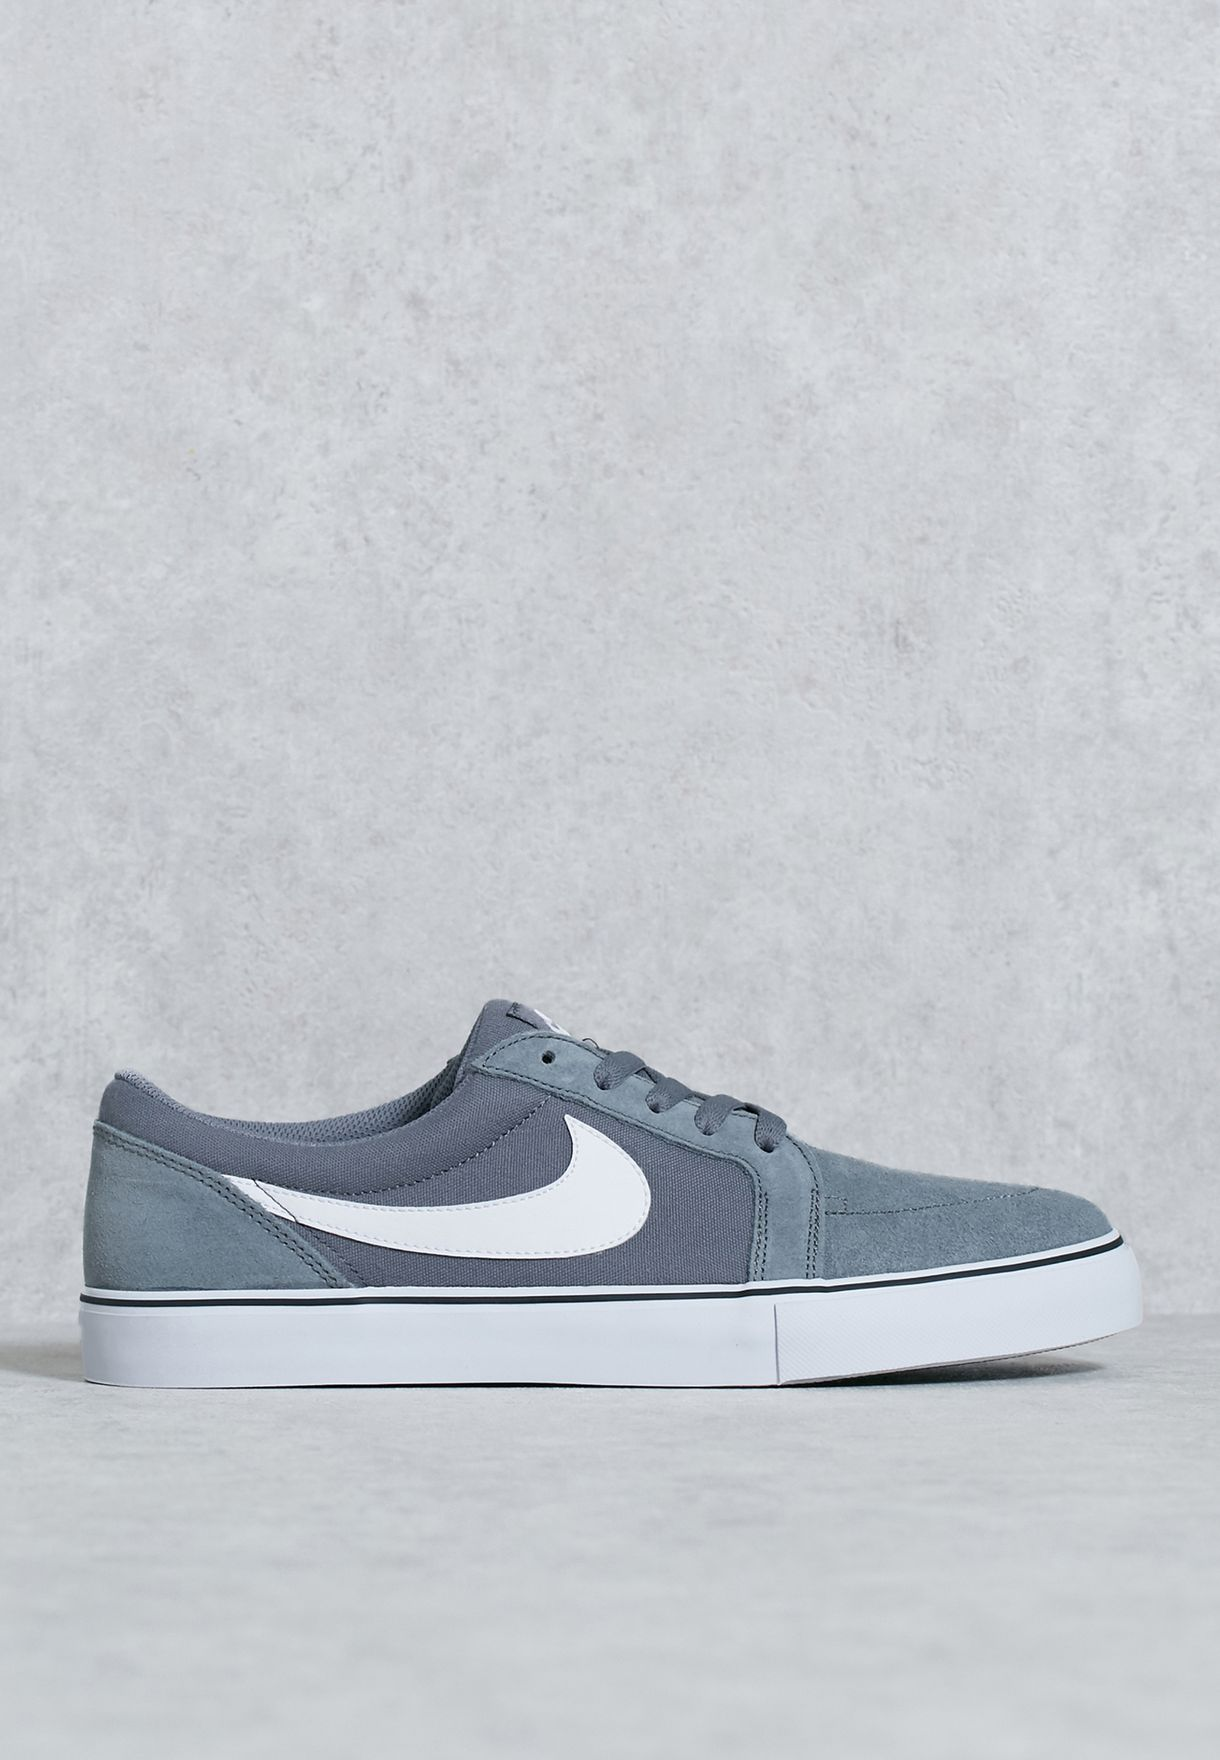 Shop Nike Grey Sb Satire Ii 729809 010 For Men In Globally